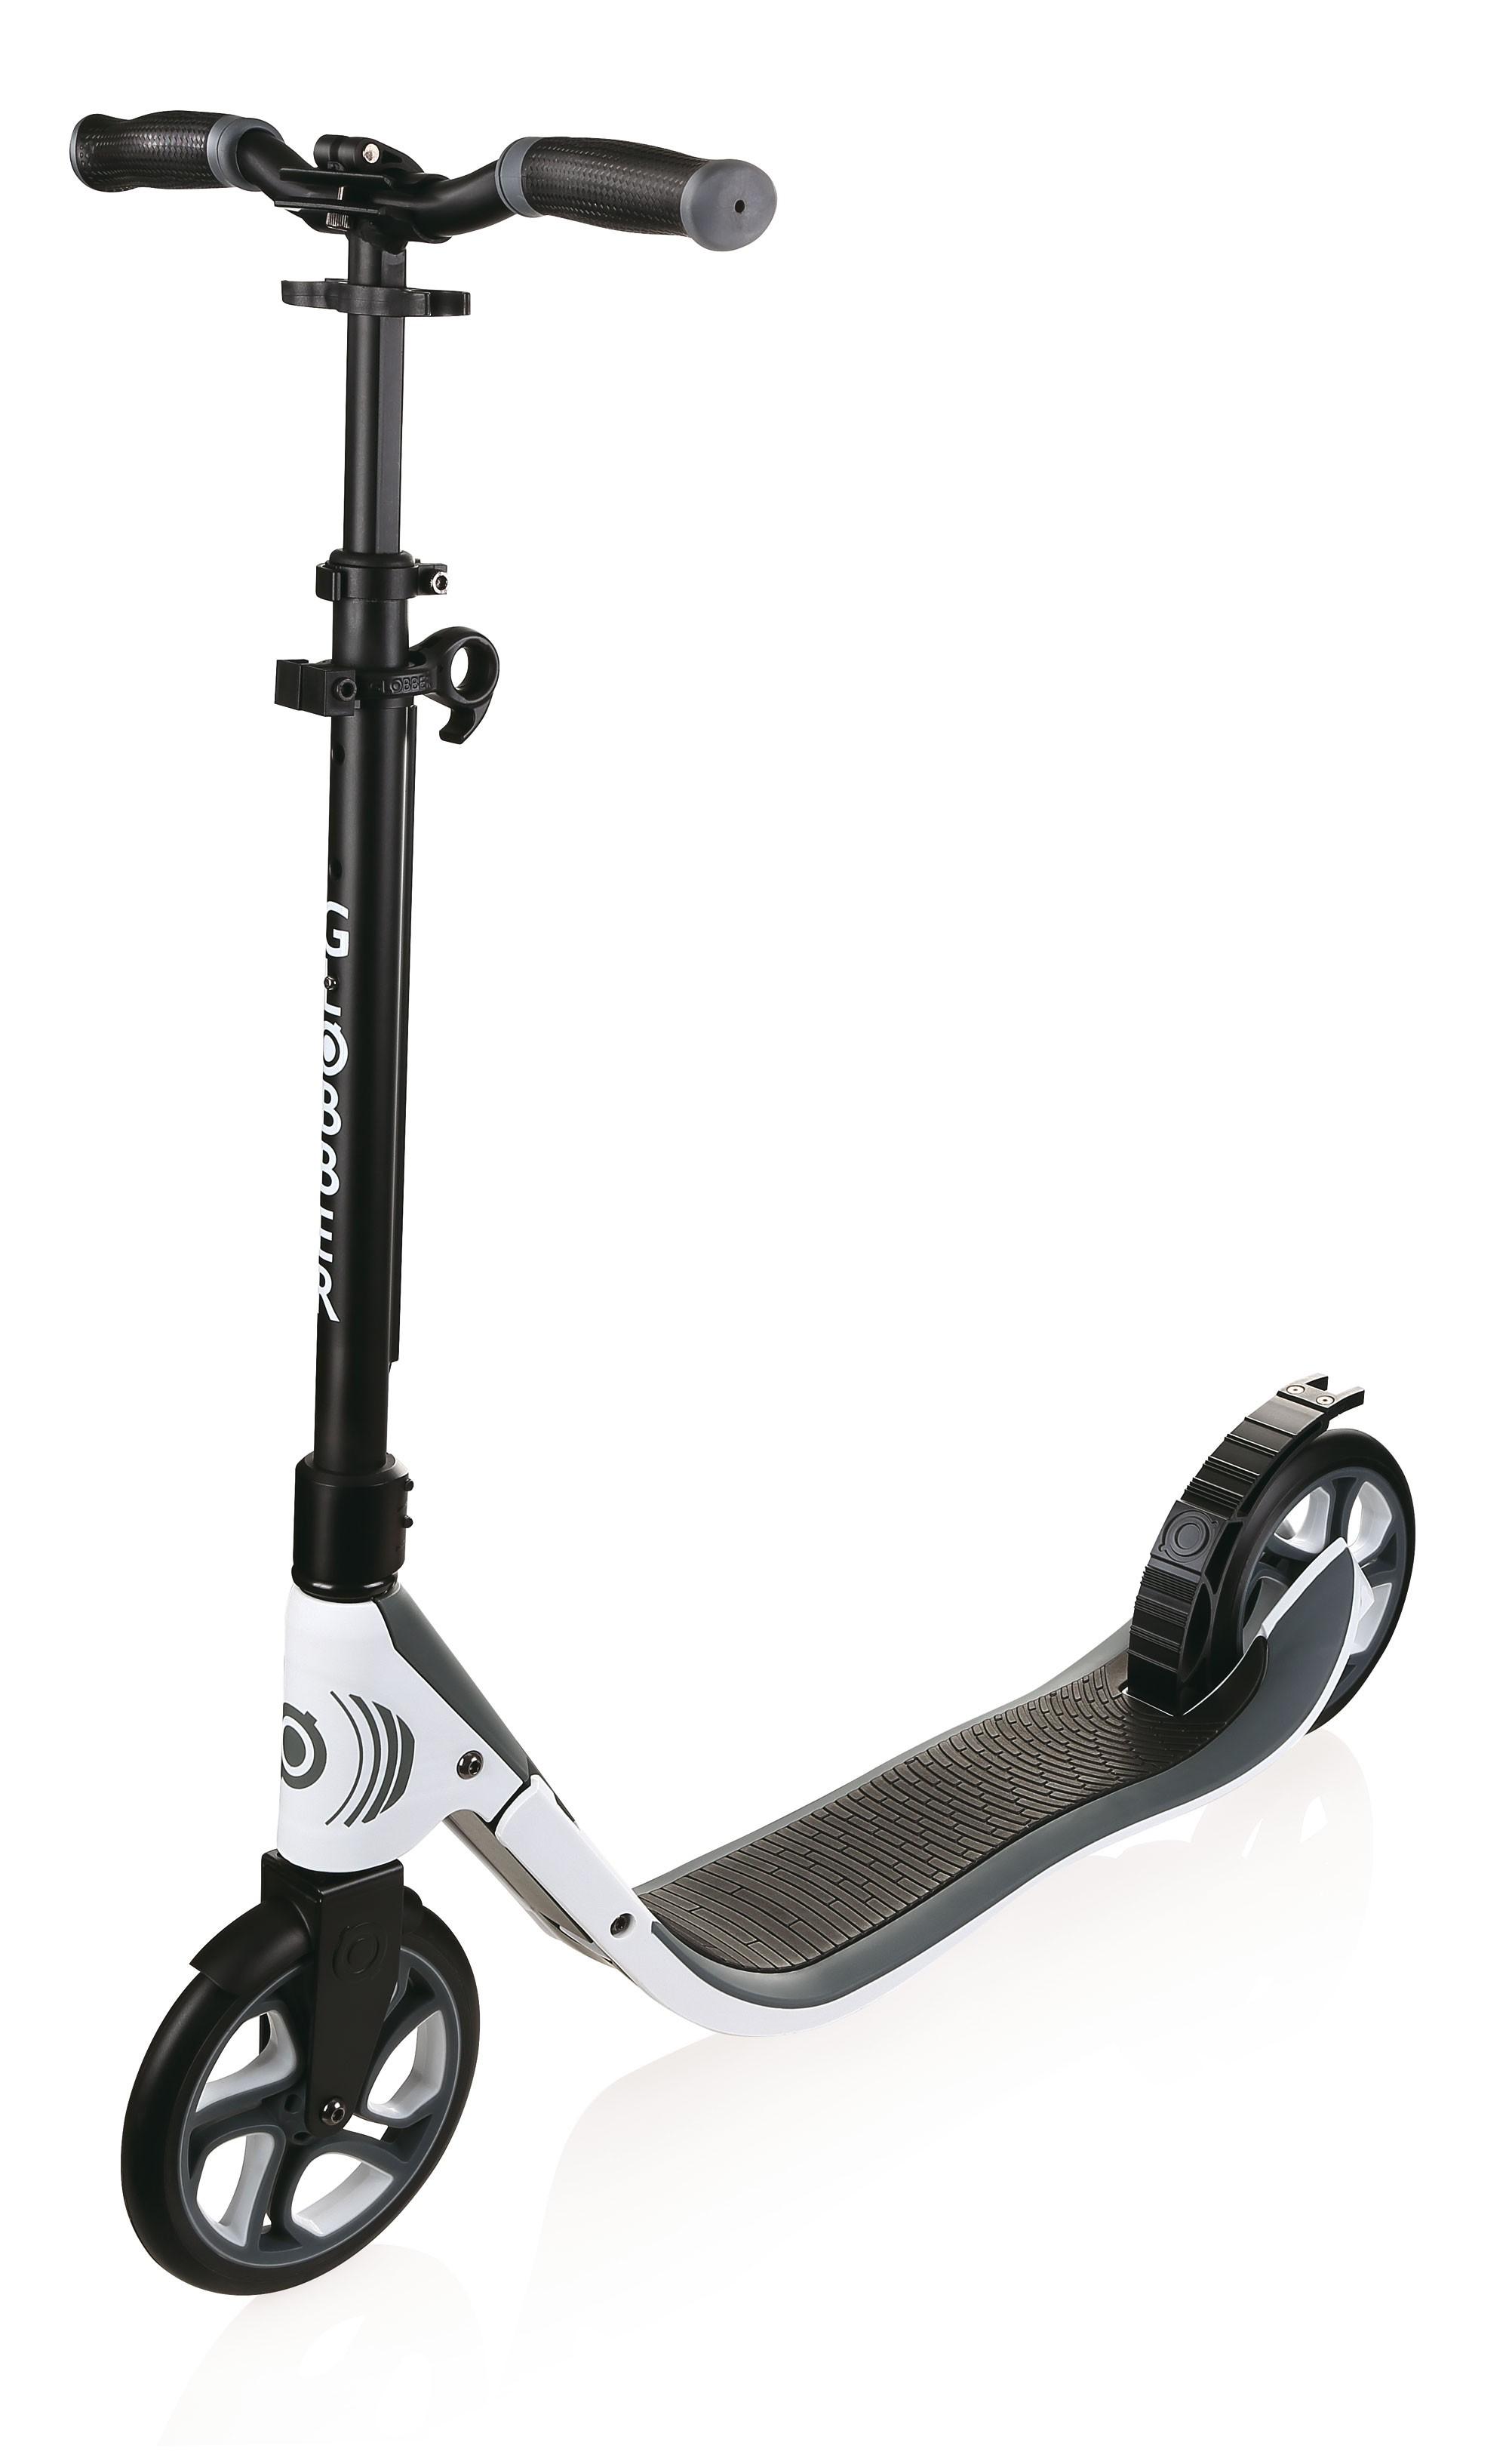 Cityroller / Alu Scooter Globber One NL 205 weiß Bild 1